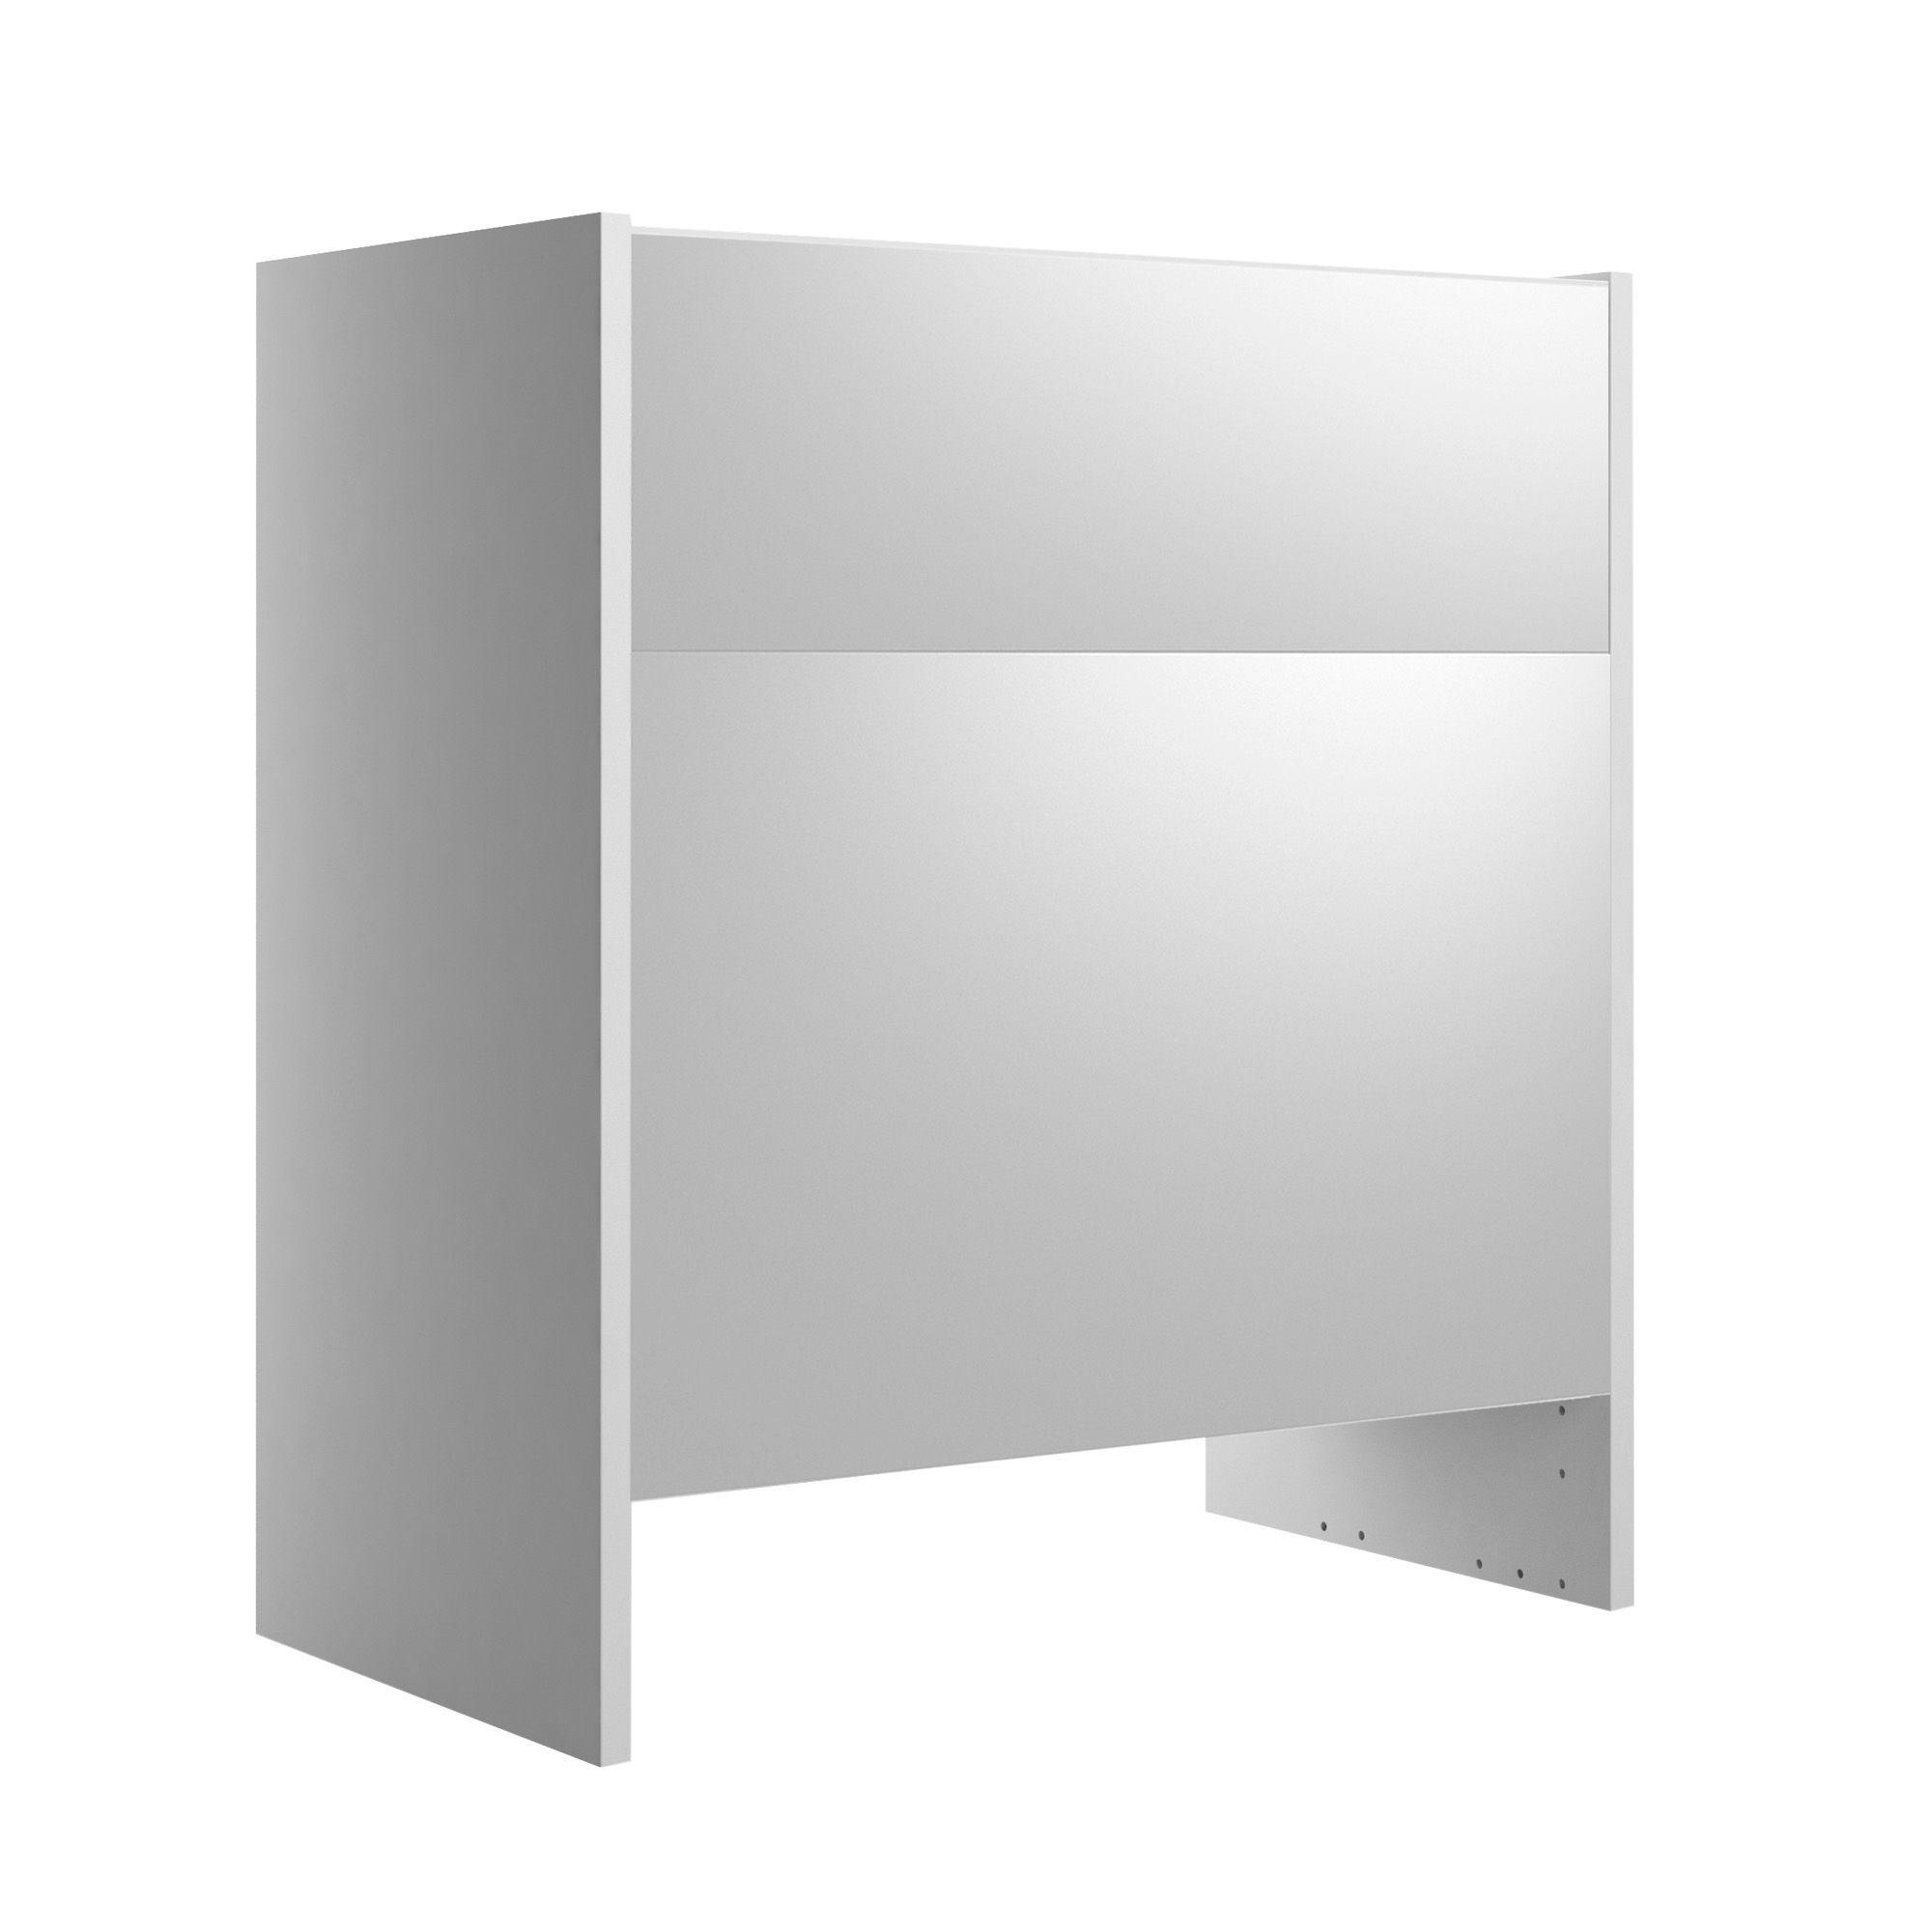 Cooke & Lewis Santini Gloss White Standard Toilet Unit, (w)600mm